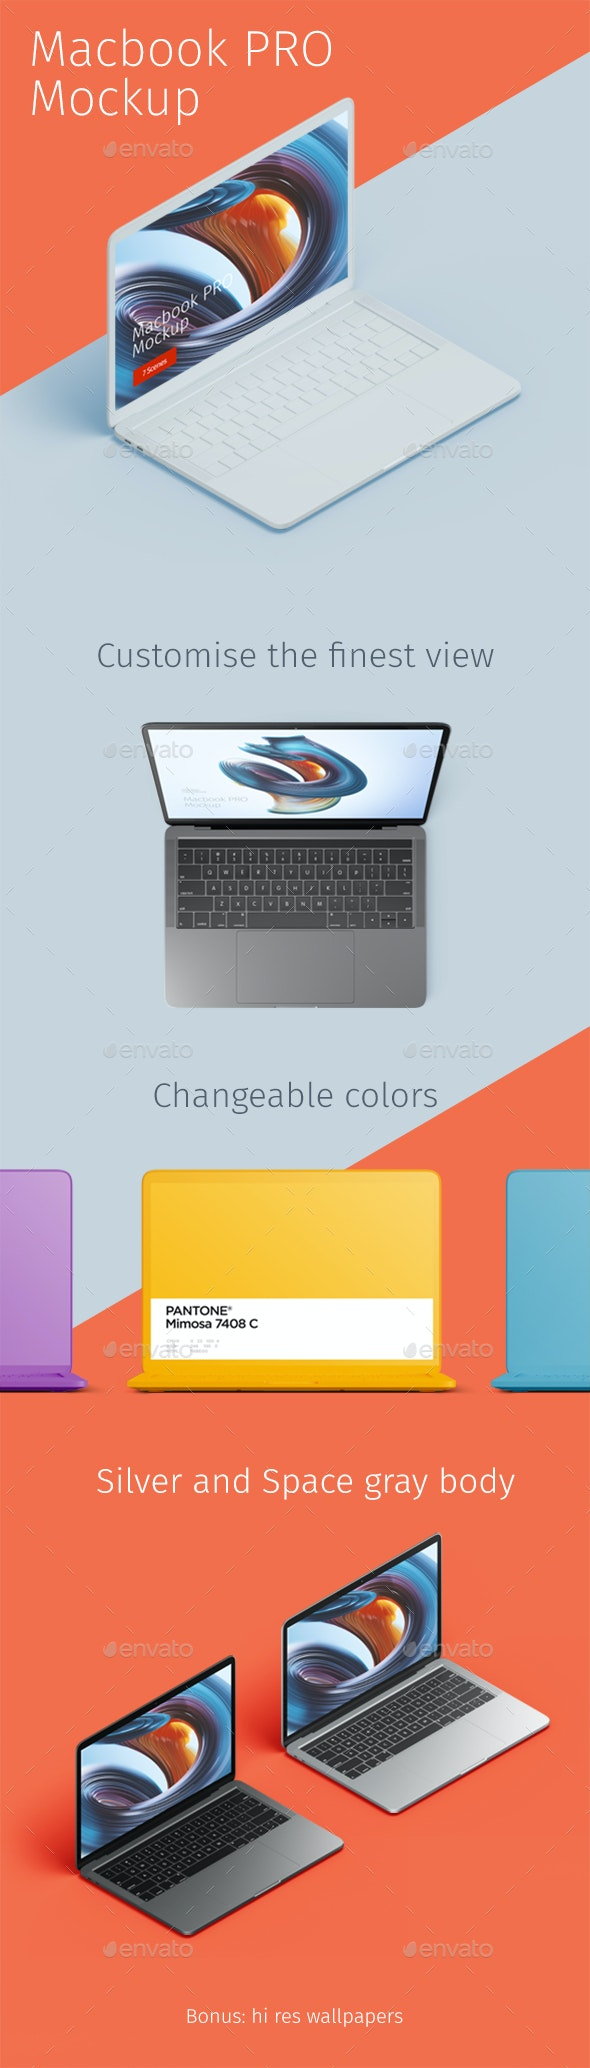 Macbook Pro Creative Mockup - Laptop Displays